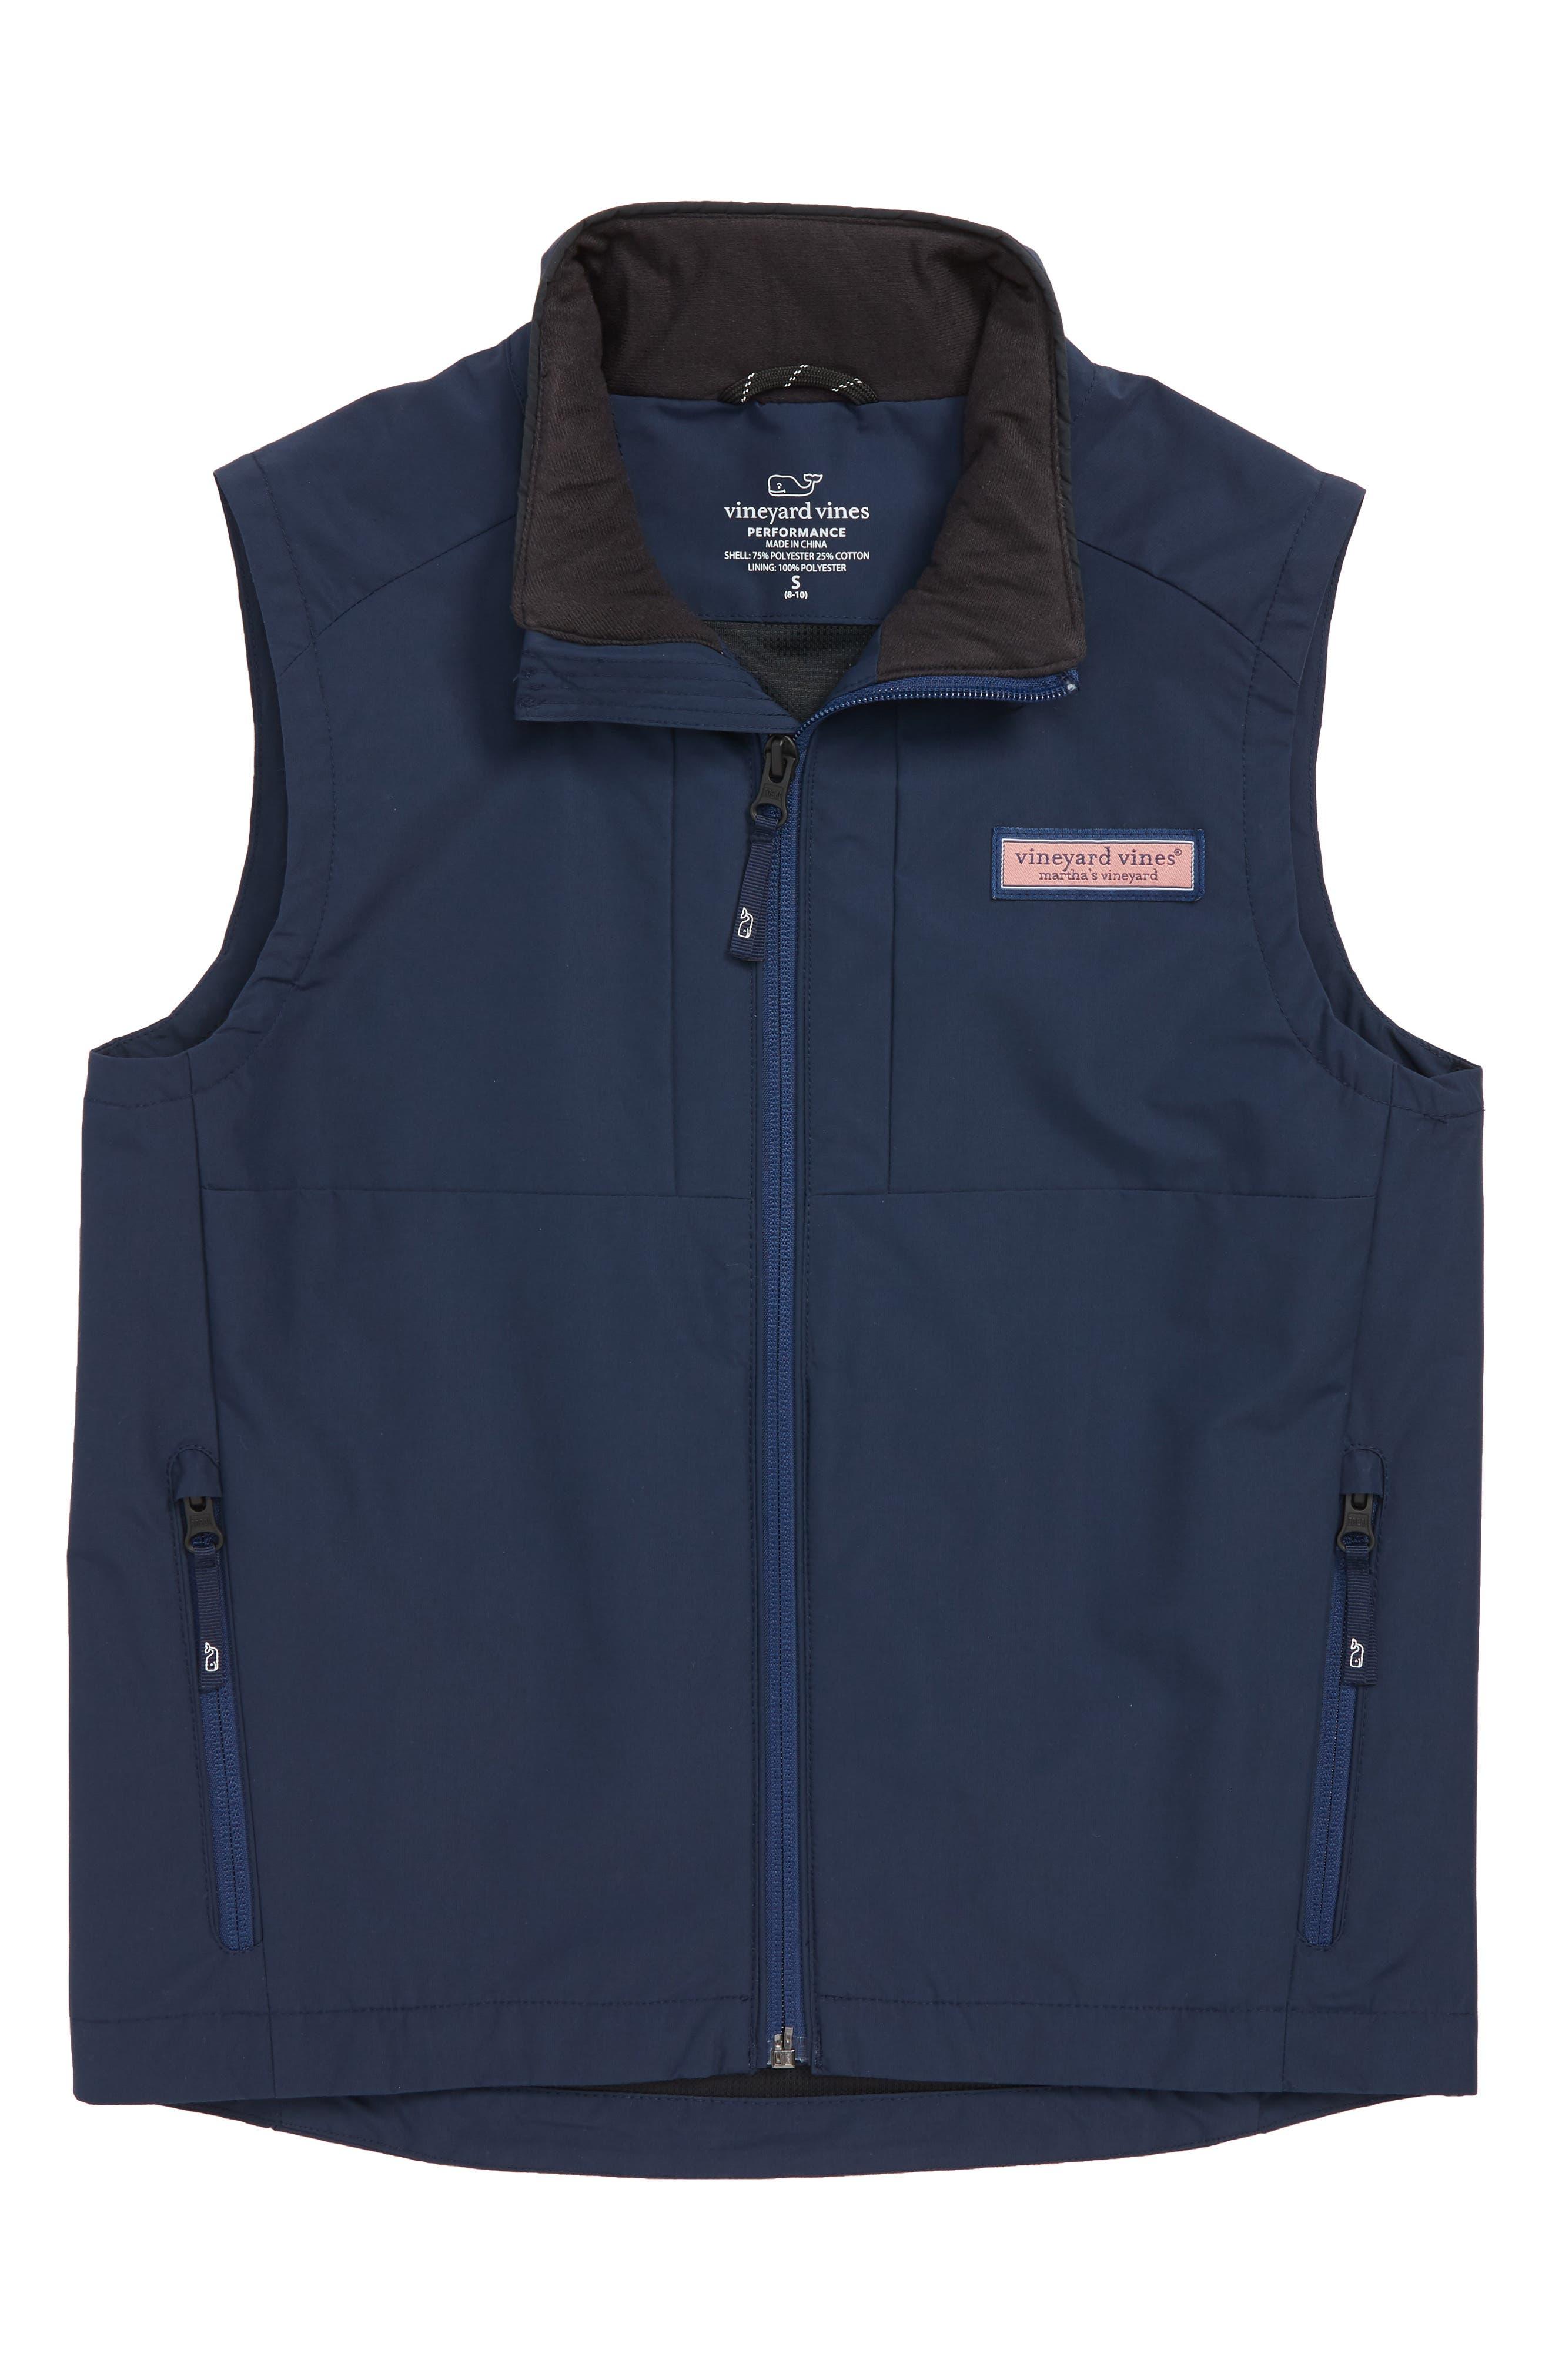 Regatta Performance Vest,                             Main thumbnail 1, color,                             400